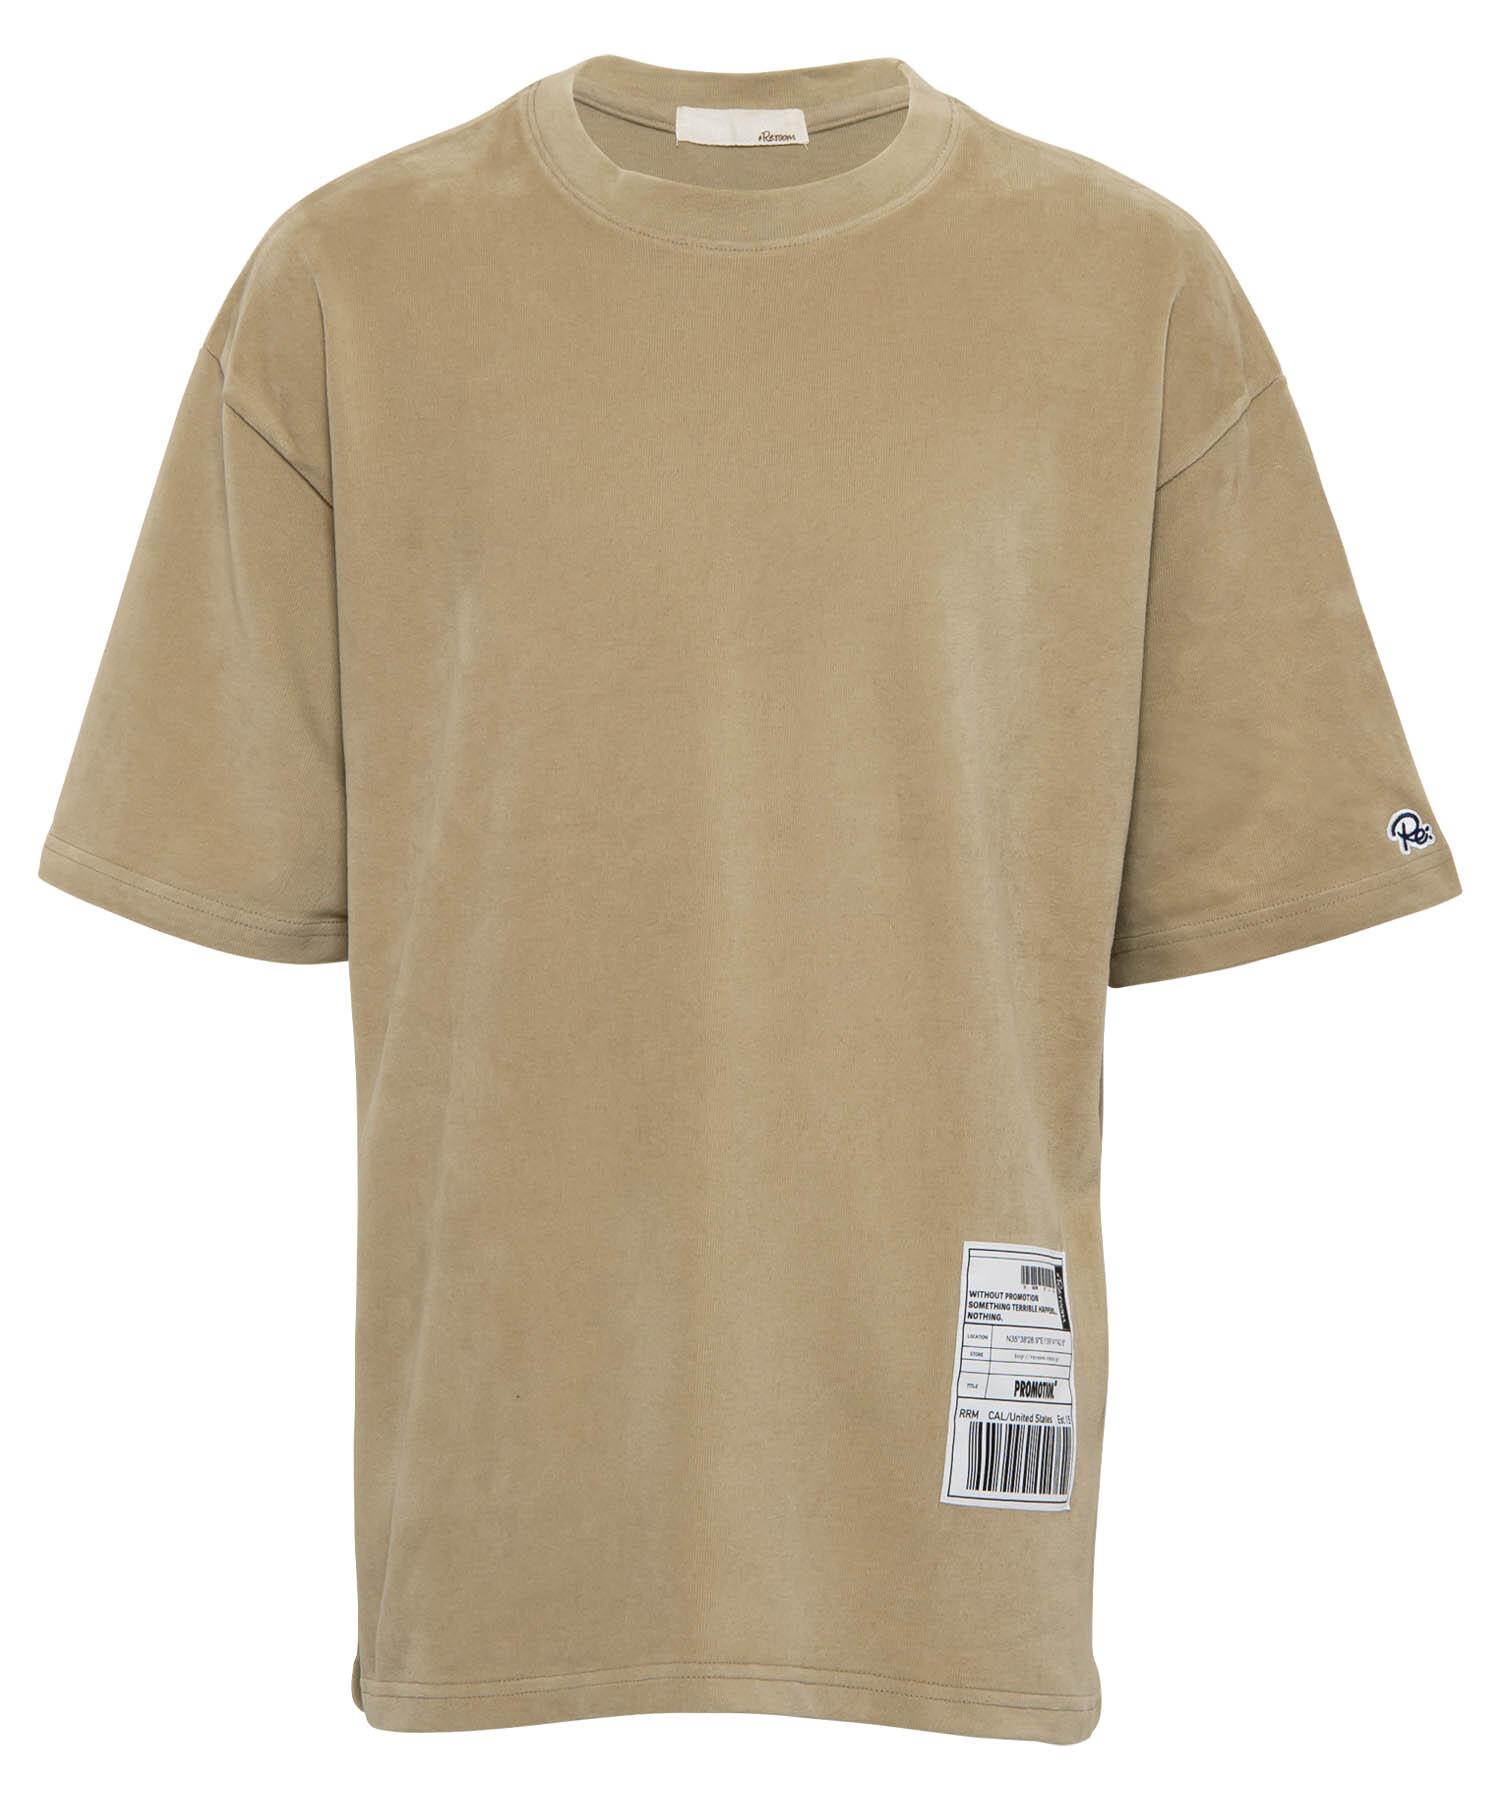 ONE POINT BIG T-shirt[REC362]